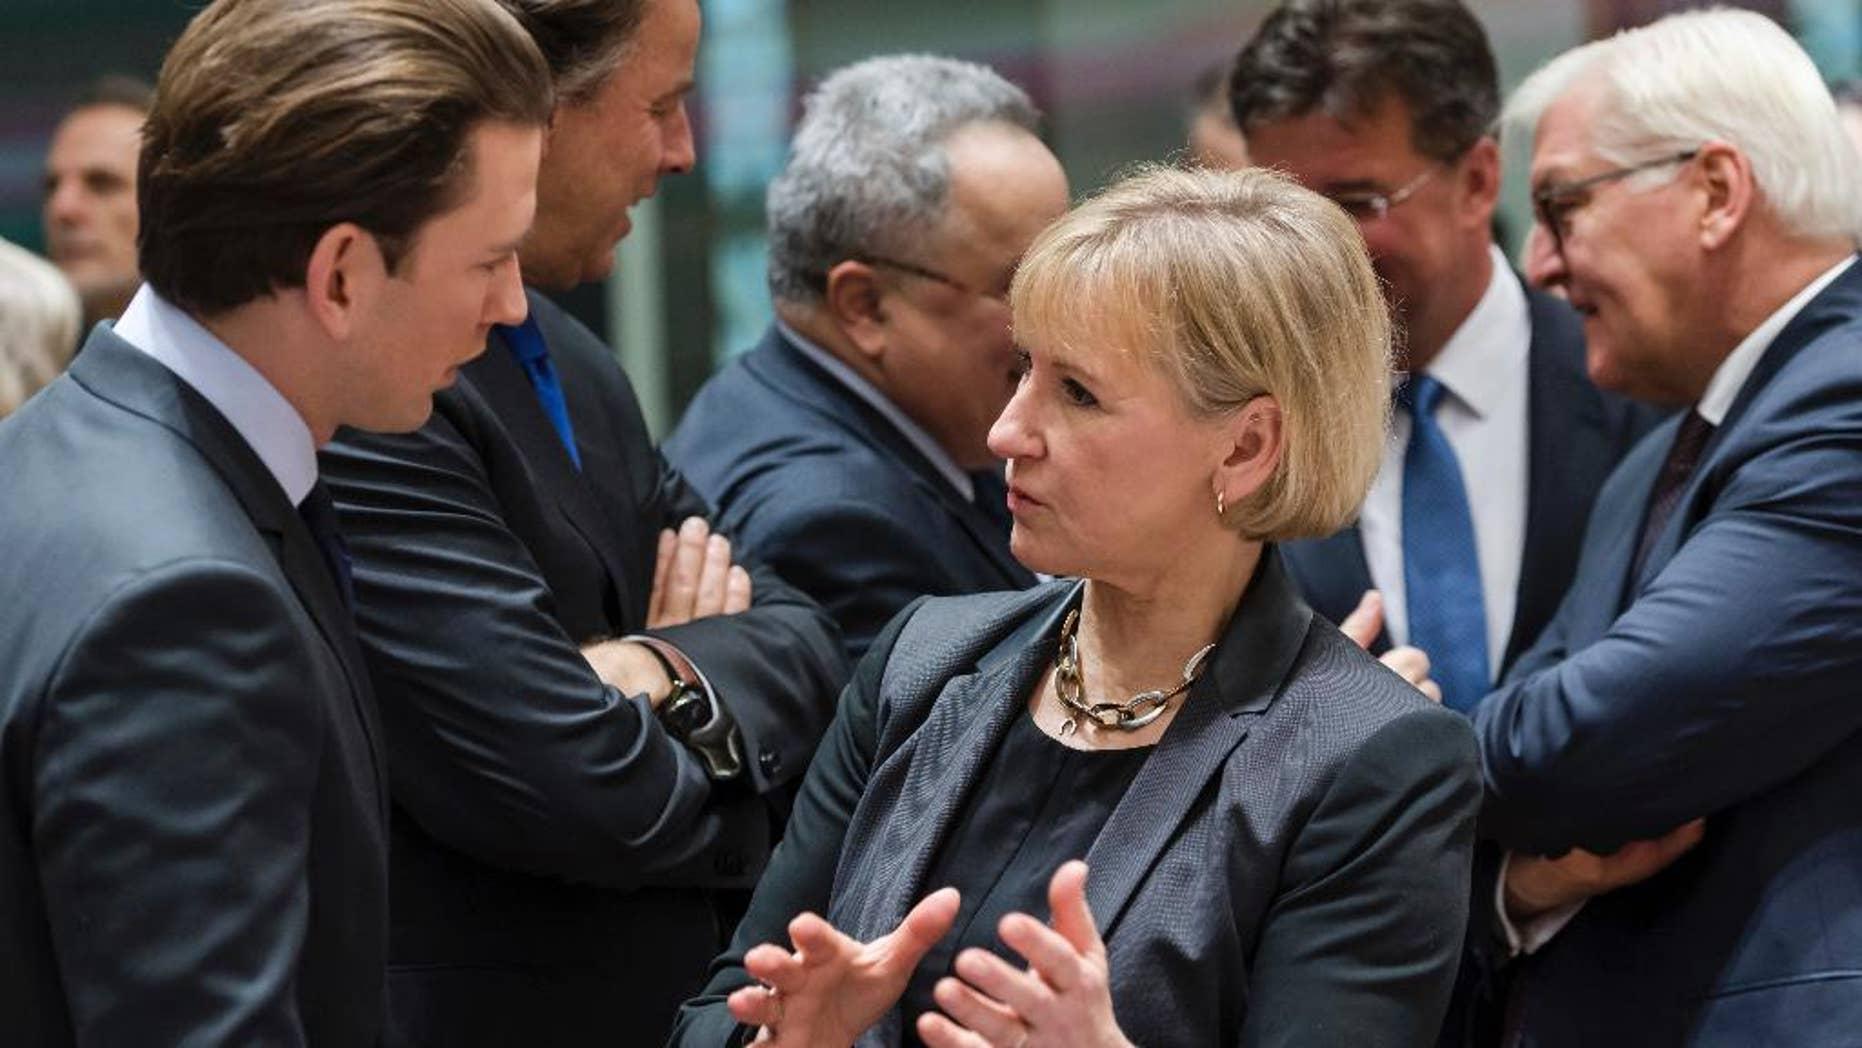 Sweden's Foreign Minister Margot Wallstrom, right, talks with Austria's Foreign Minister Sebastian Kurz during an EU foreign ministers meeting at the EU Council in Brussels on Monday, Jan. 16, 2017. (AP Photo/Geert Vanden Wijngaert)